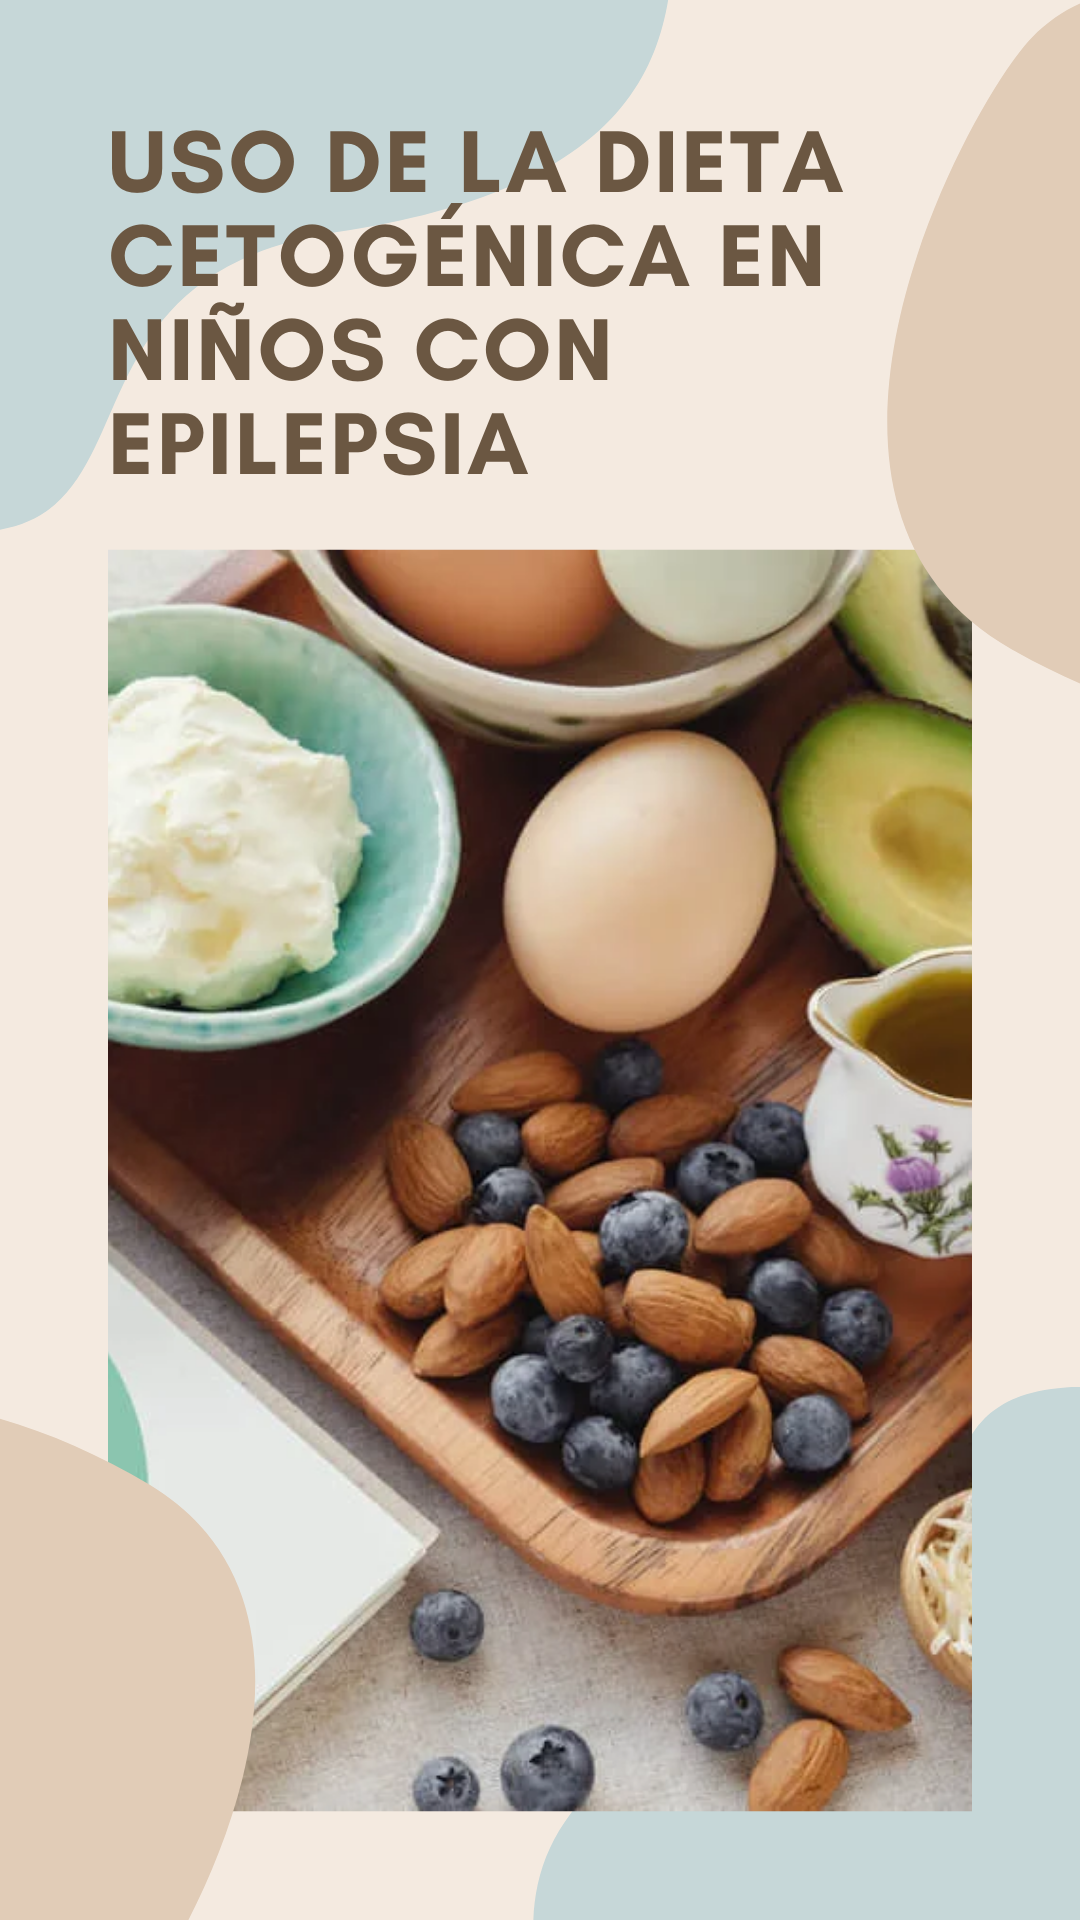 dieta cetosisgenica para epilepsia en ninos